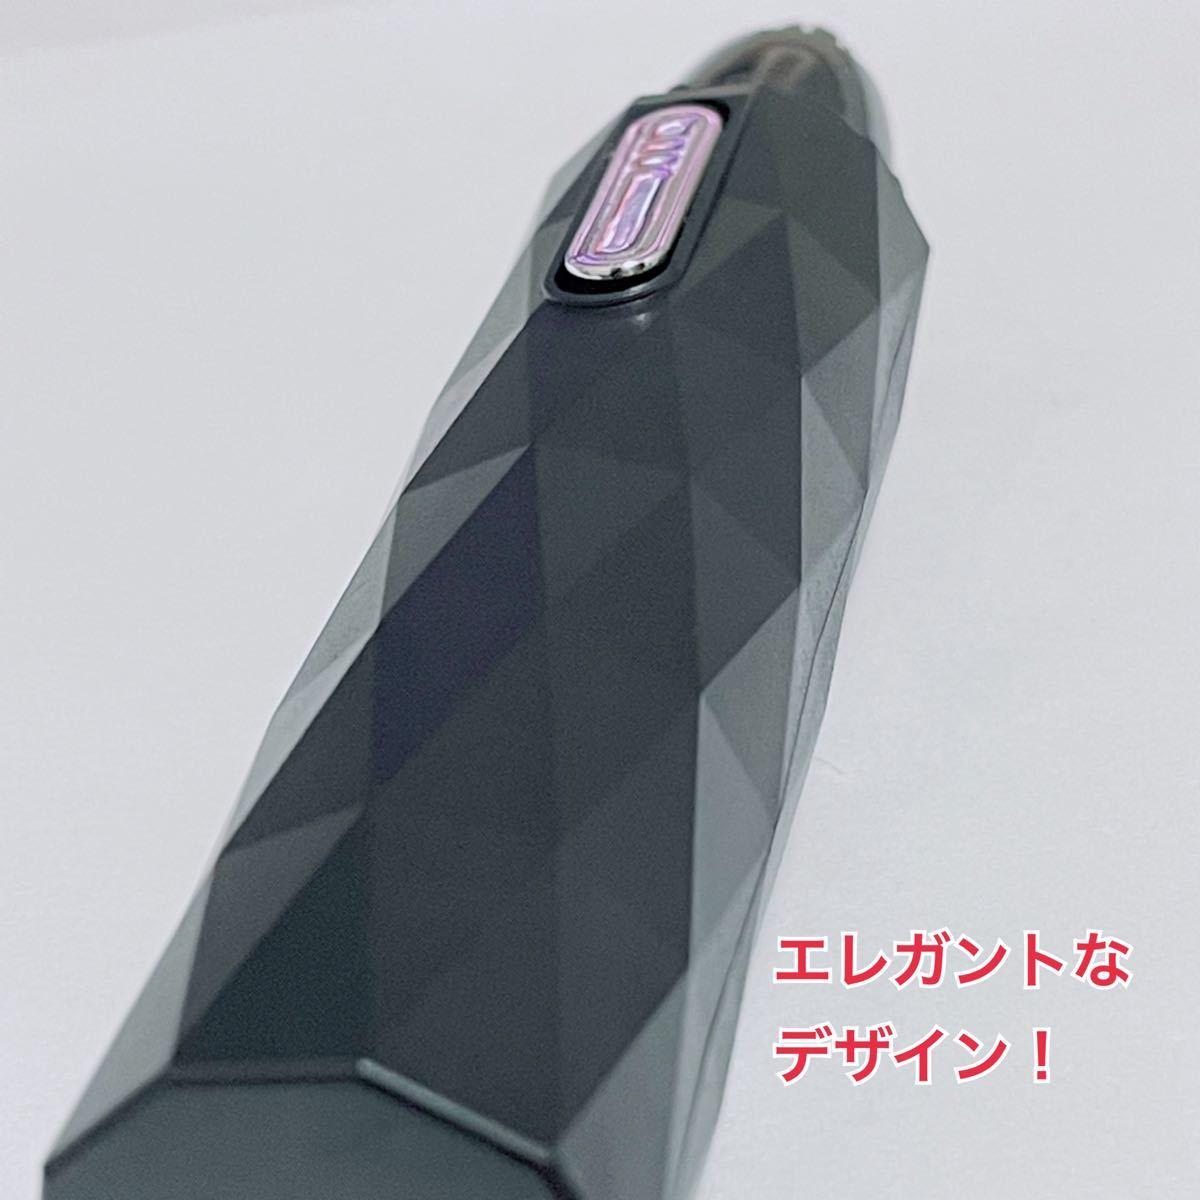 21年新作 鼻毛カッター 耳毛カッター USB充電式水洗い可能 小型 男女兼用